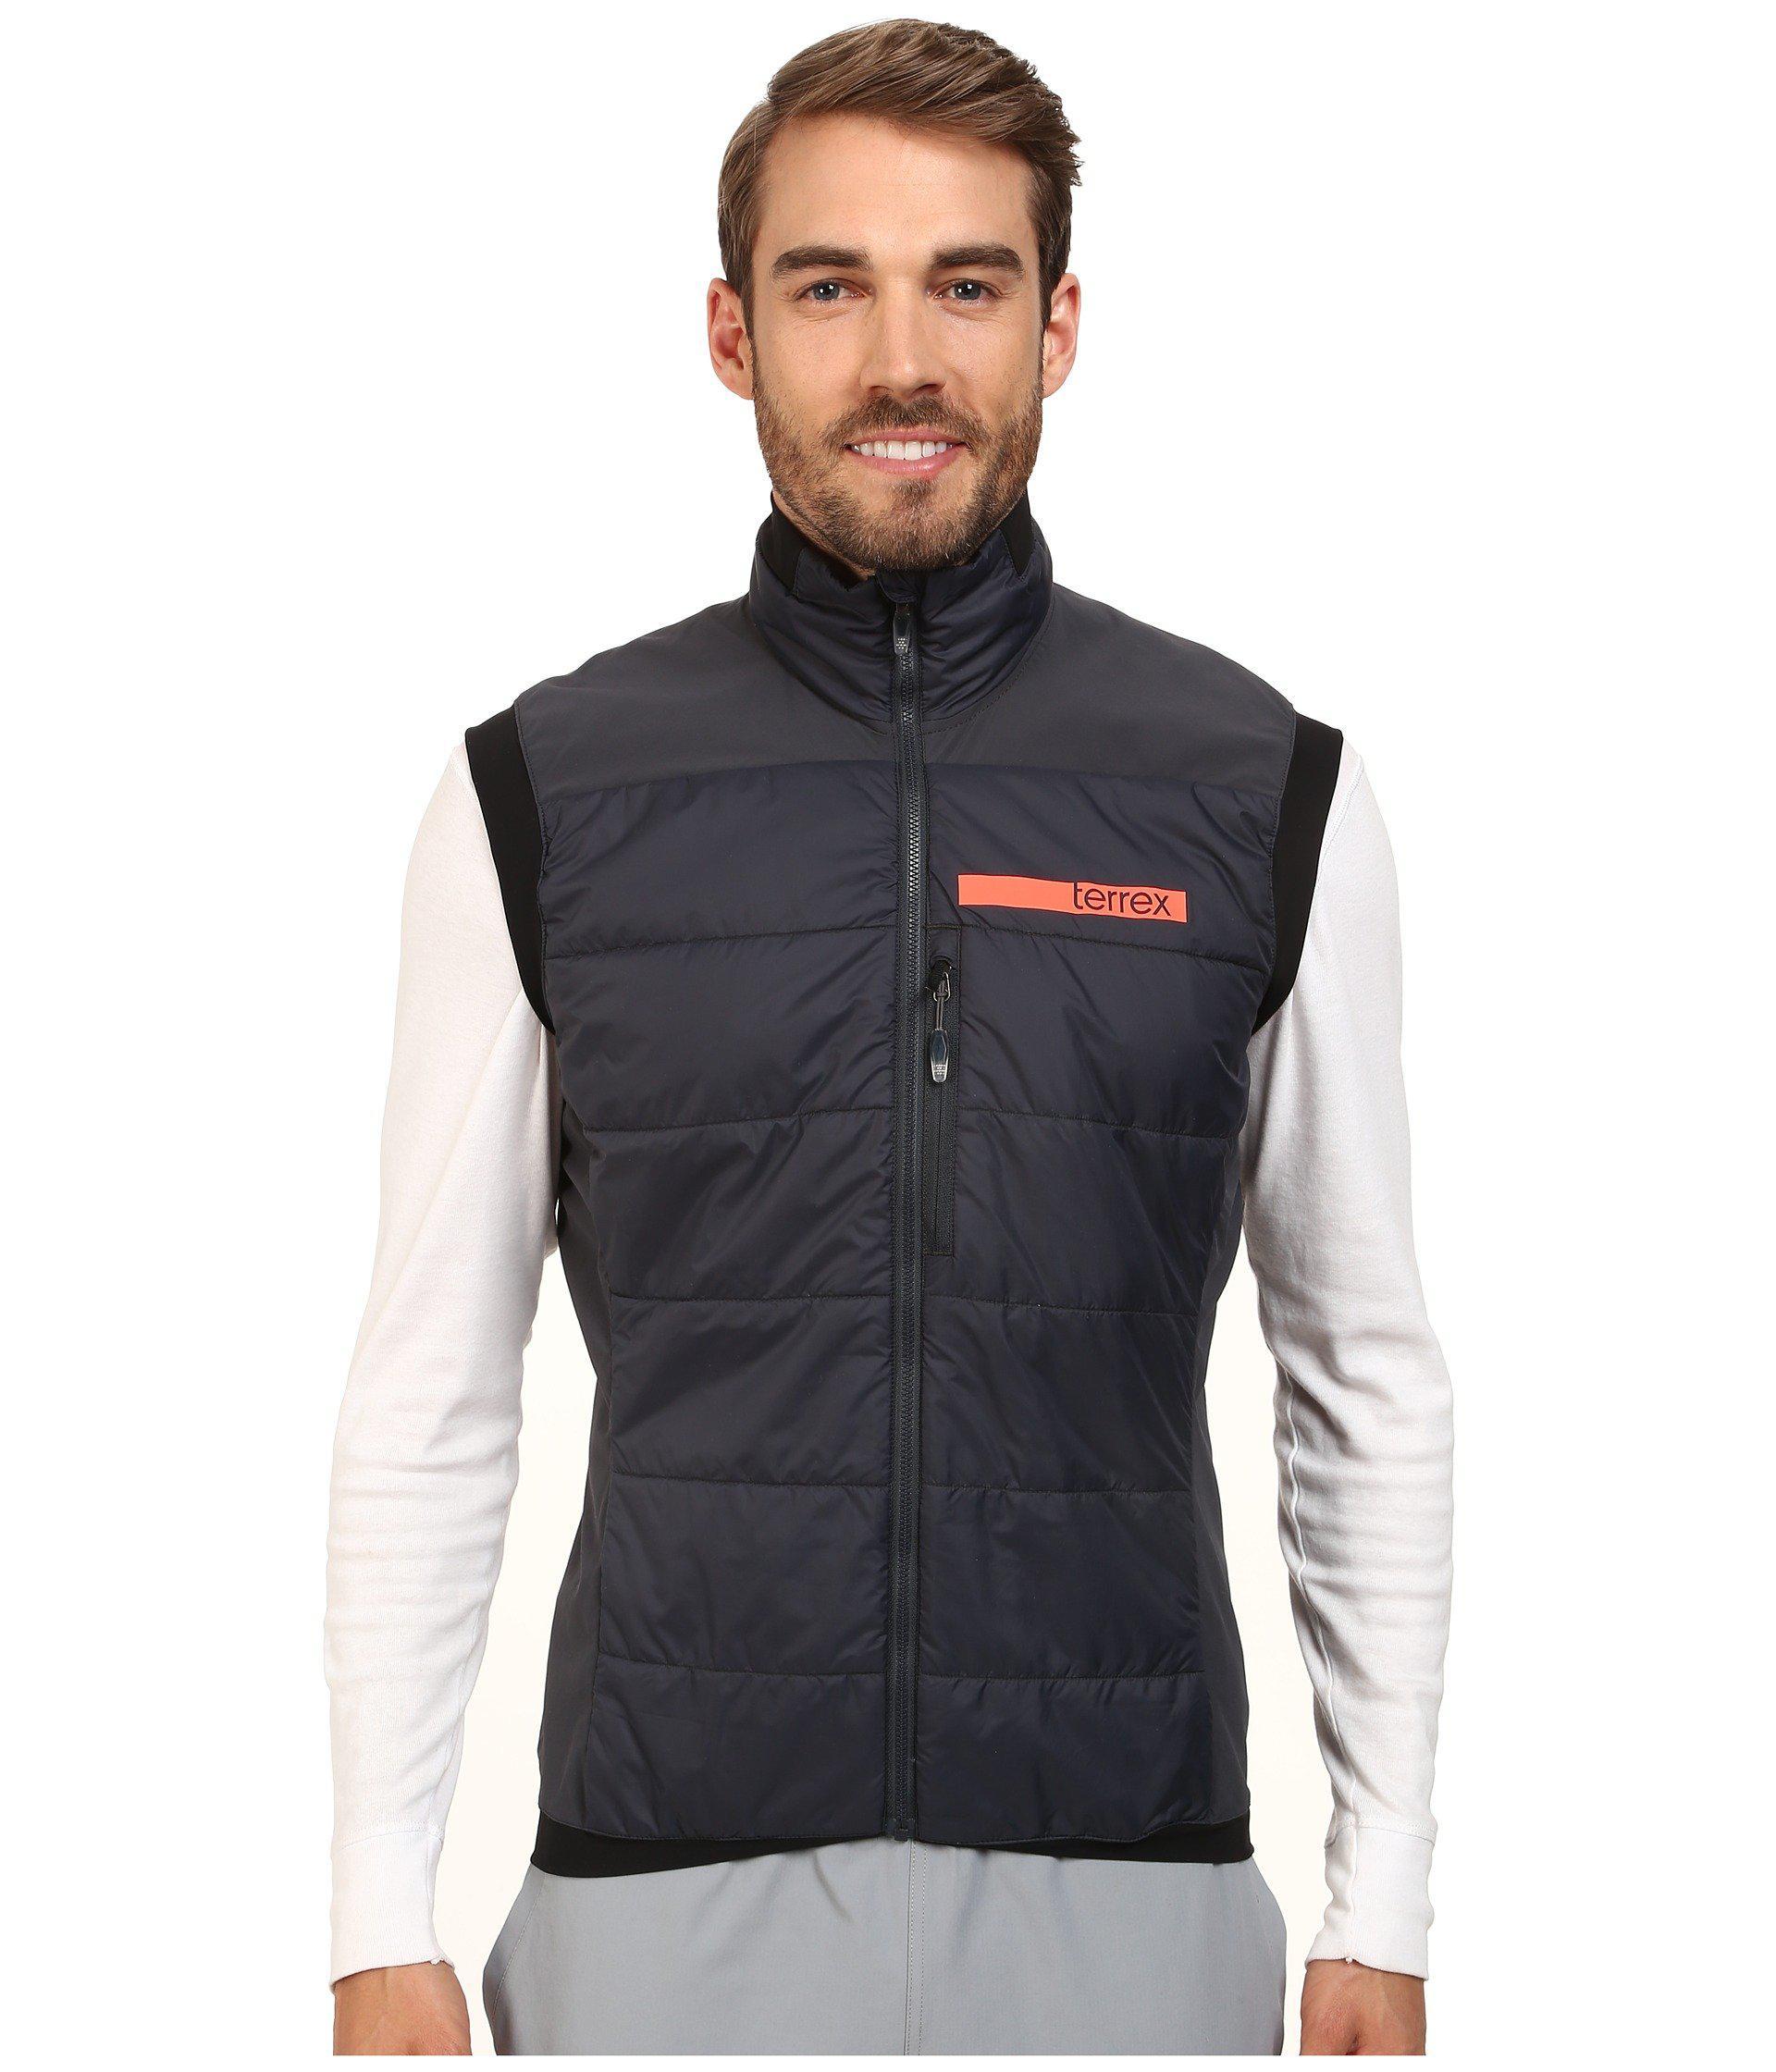 52d5e9c6370 Lyst - adidas Originals Terrex Skyclimb Insulation Vest 2 in Gray ...